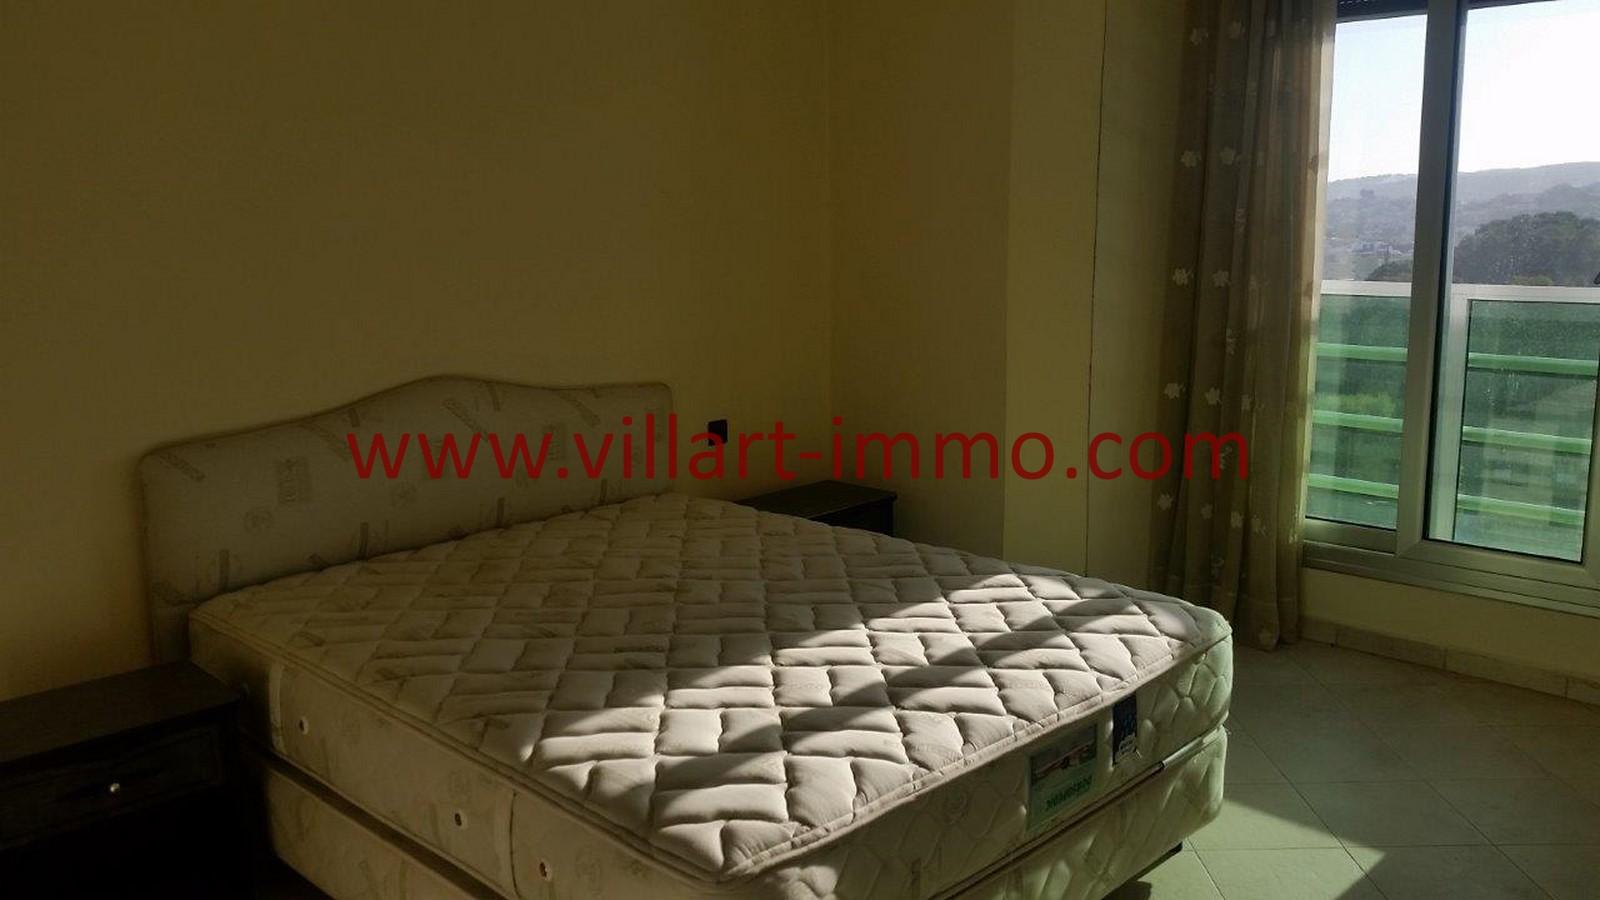 5-location-appartement-meubles-tanger-iberia-chambre-1-l1012-villart-immo-maroc